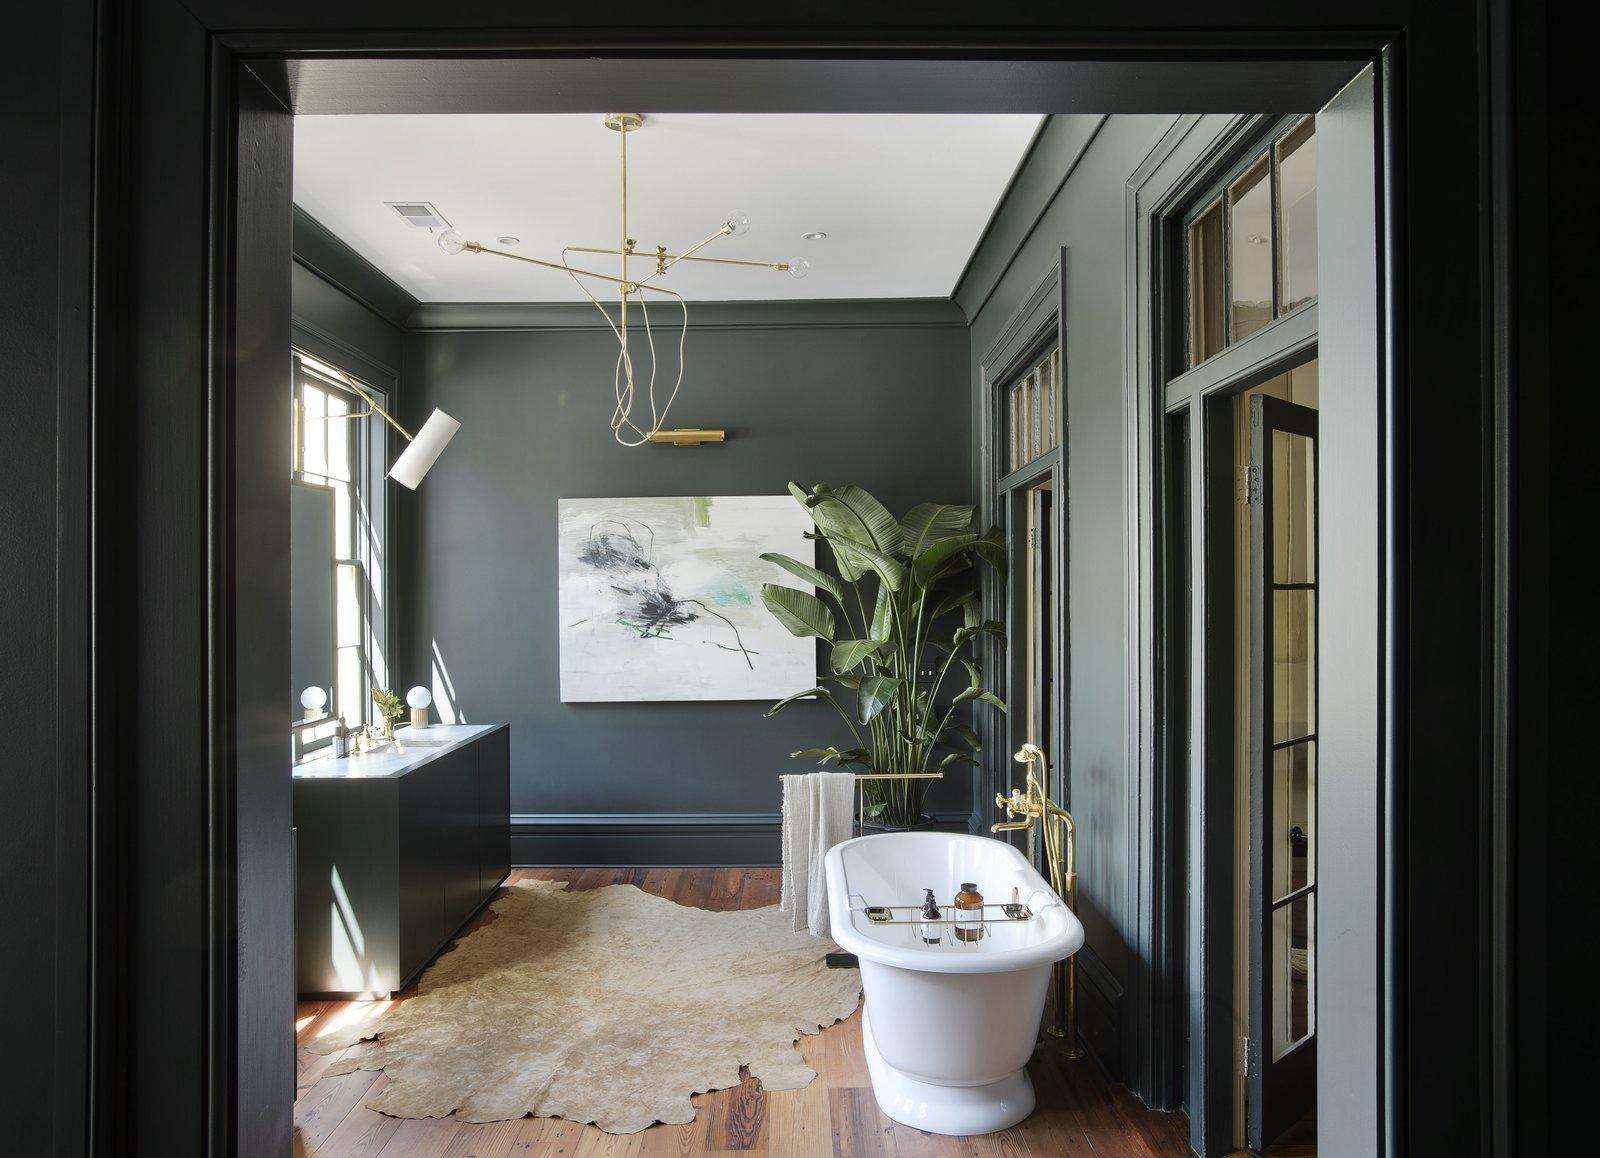 9 Modern Bathroom Ideas That Go Off The Beaten Path